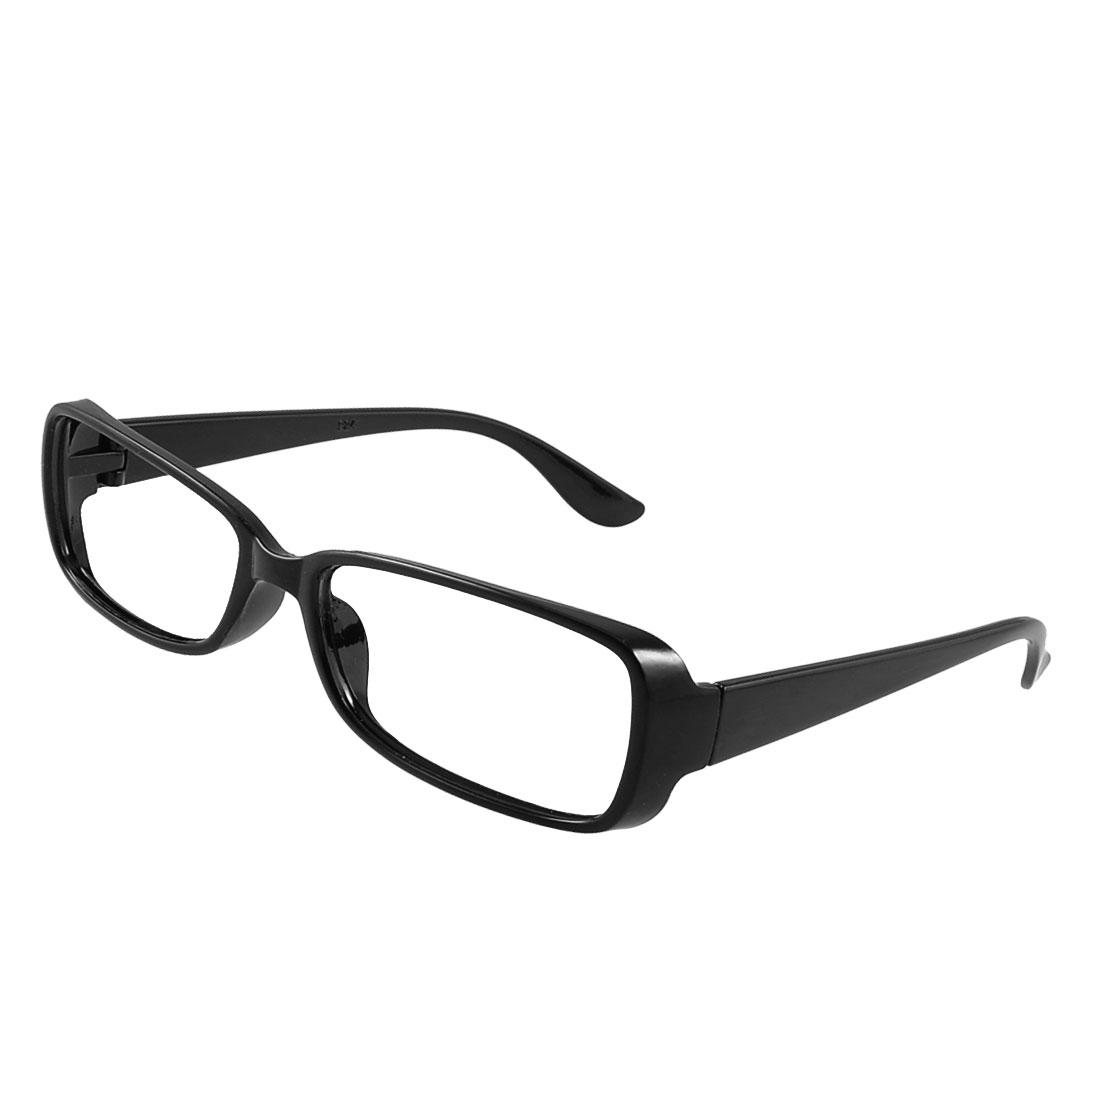 black plastic arm retro style spectacles glasses